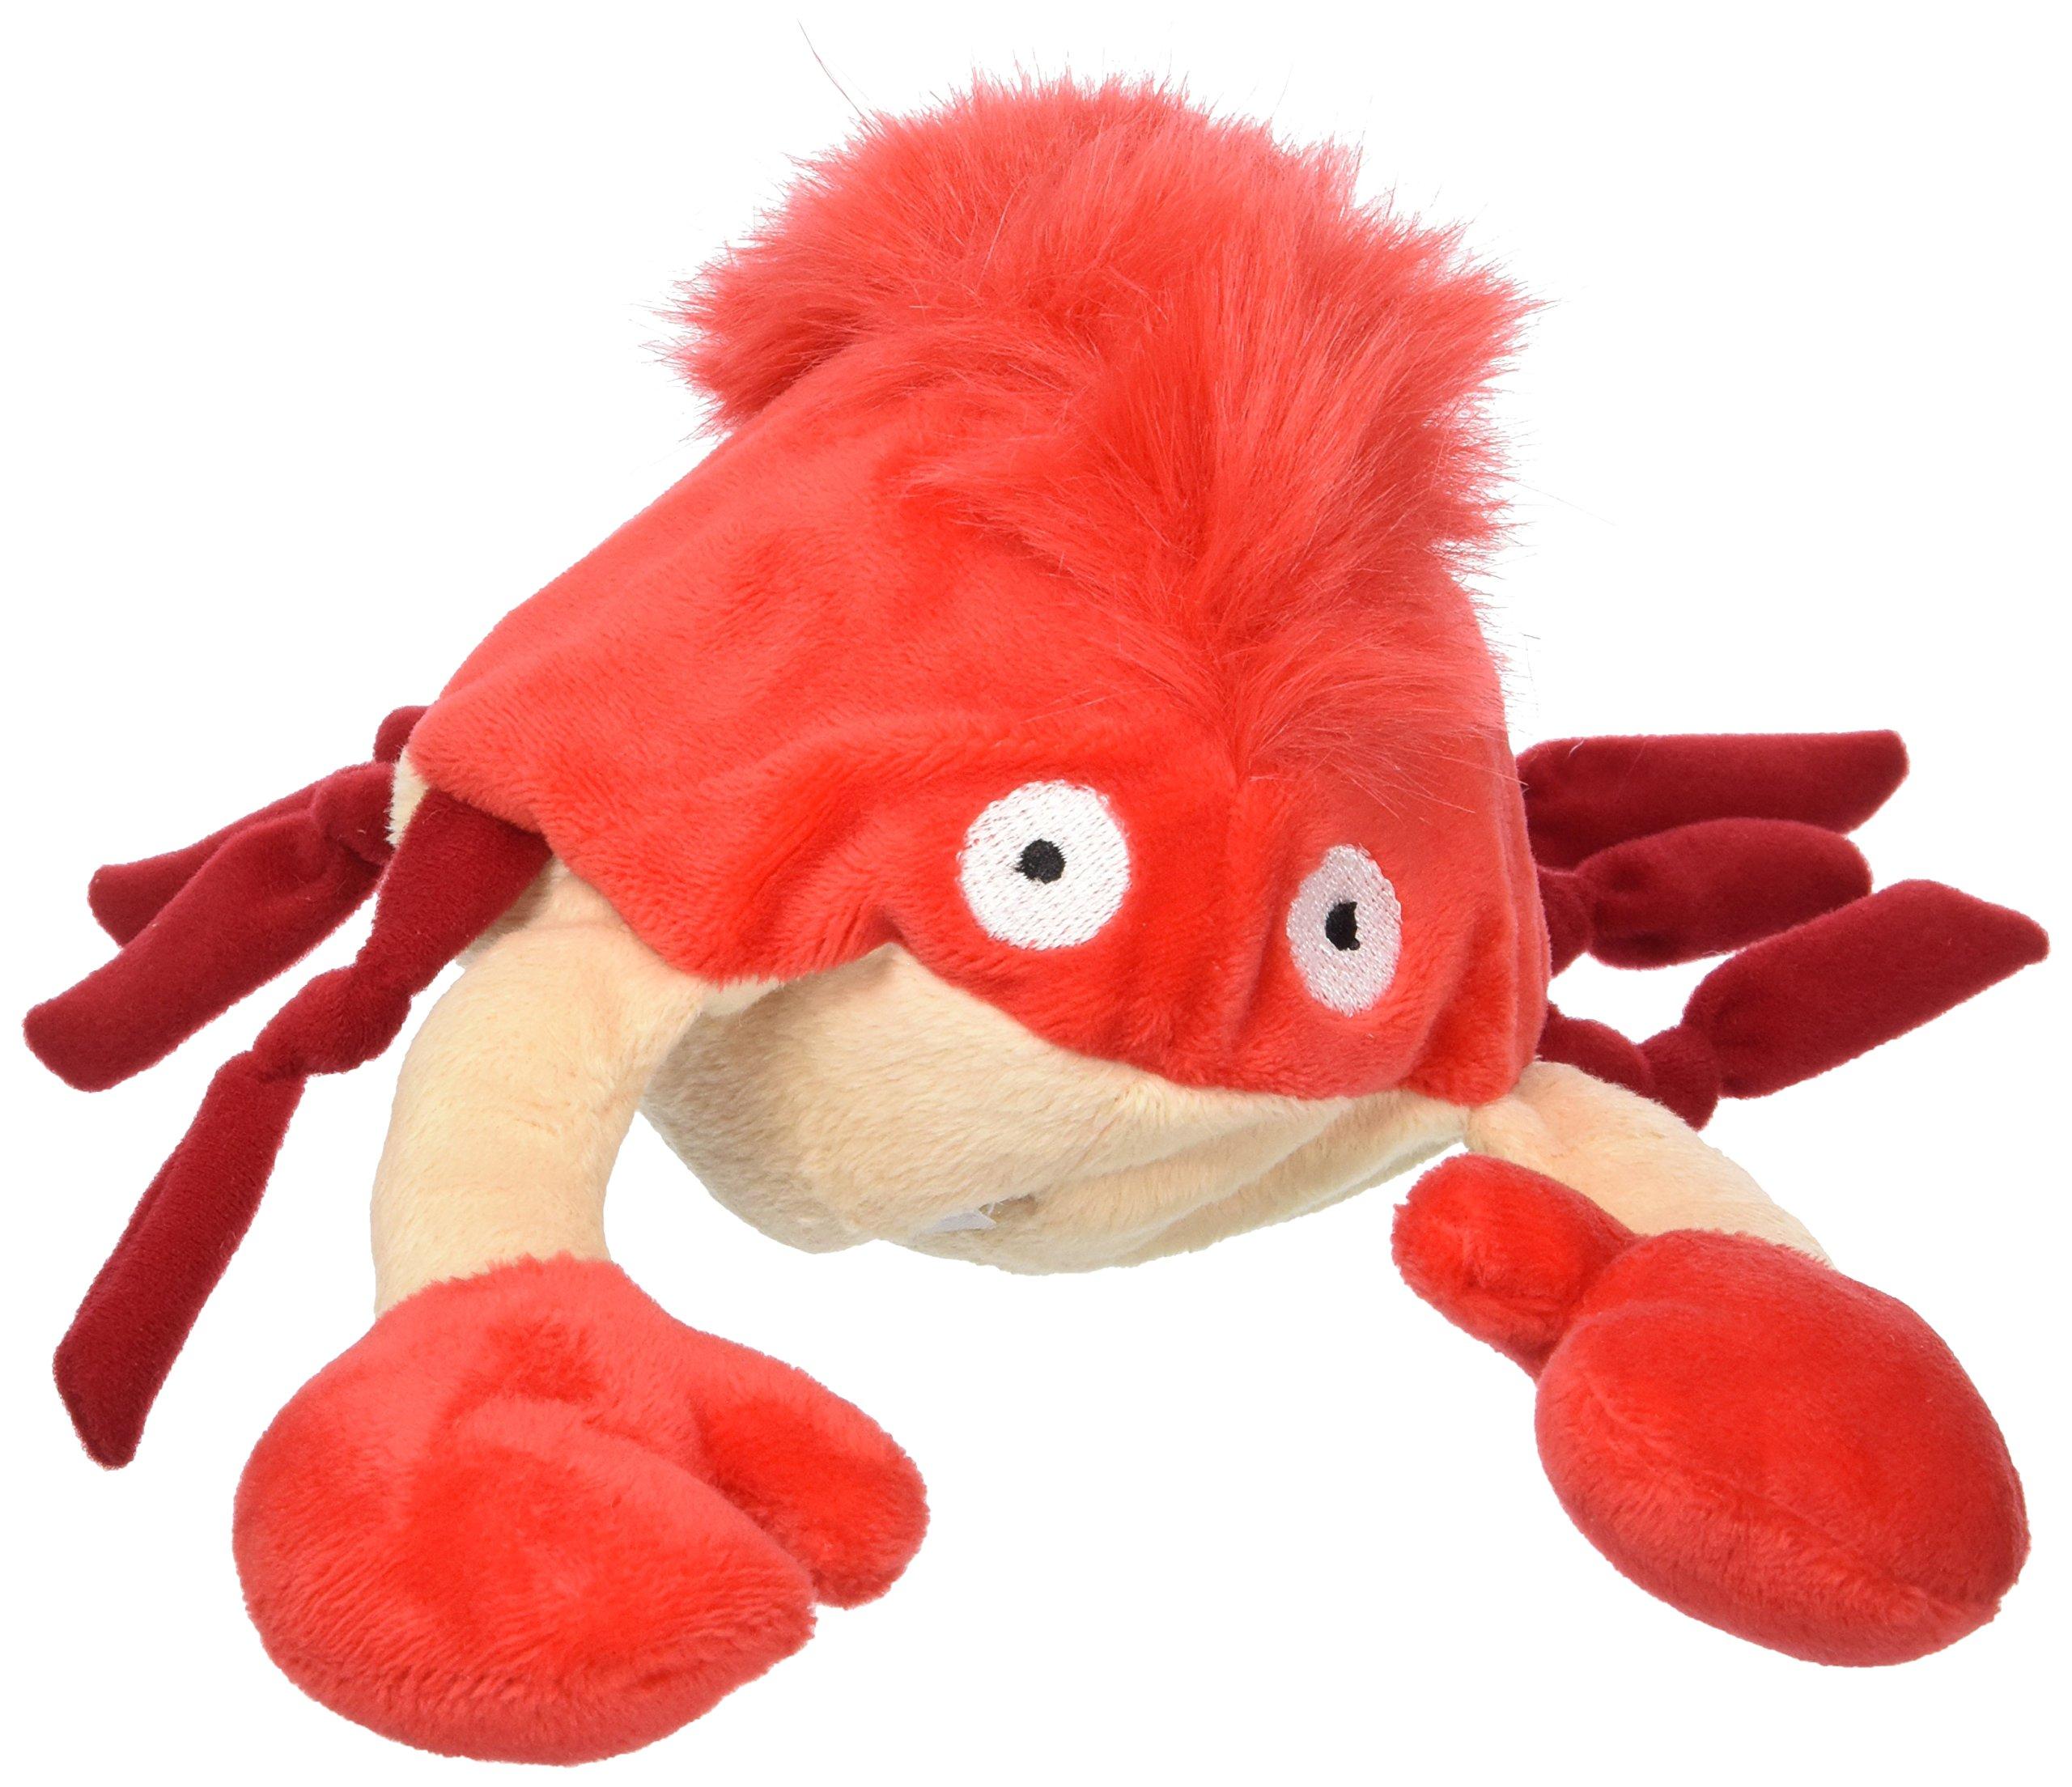 Hyper Pet Doggie Pal Crab Plush Interactive Dog Toy